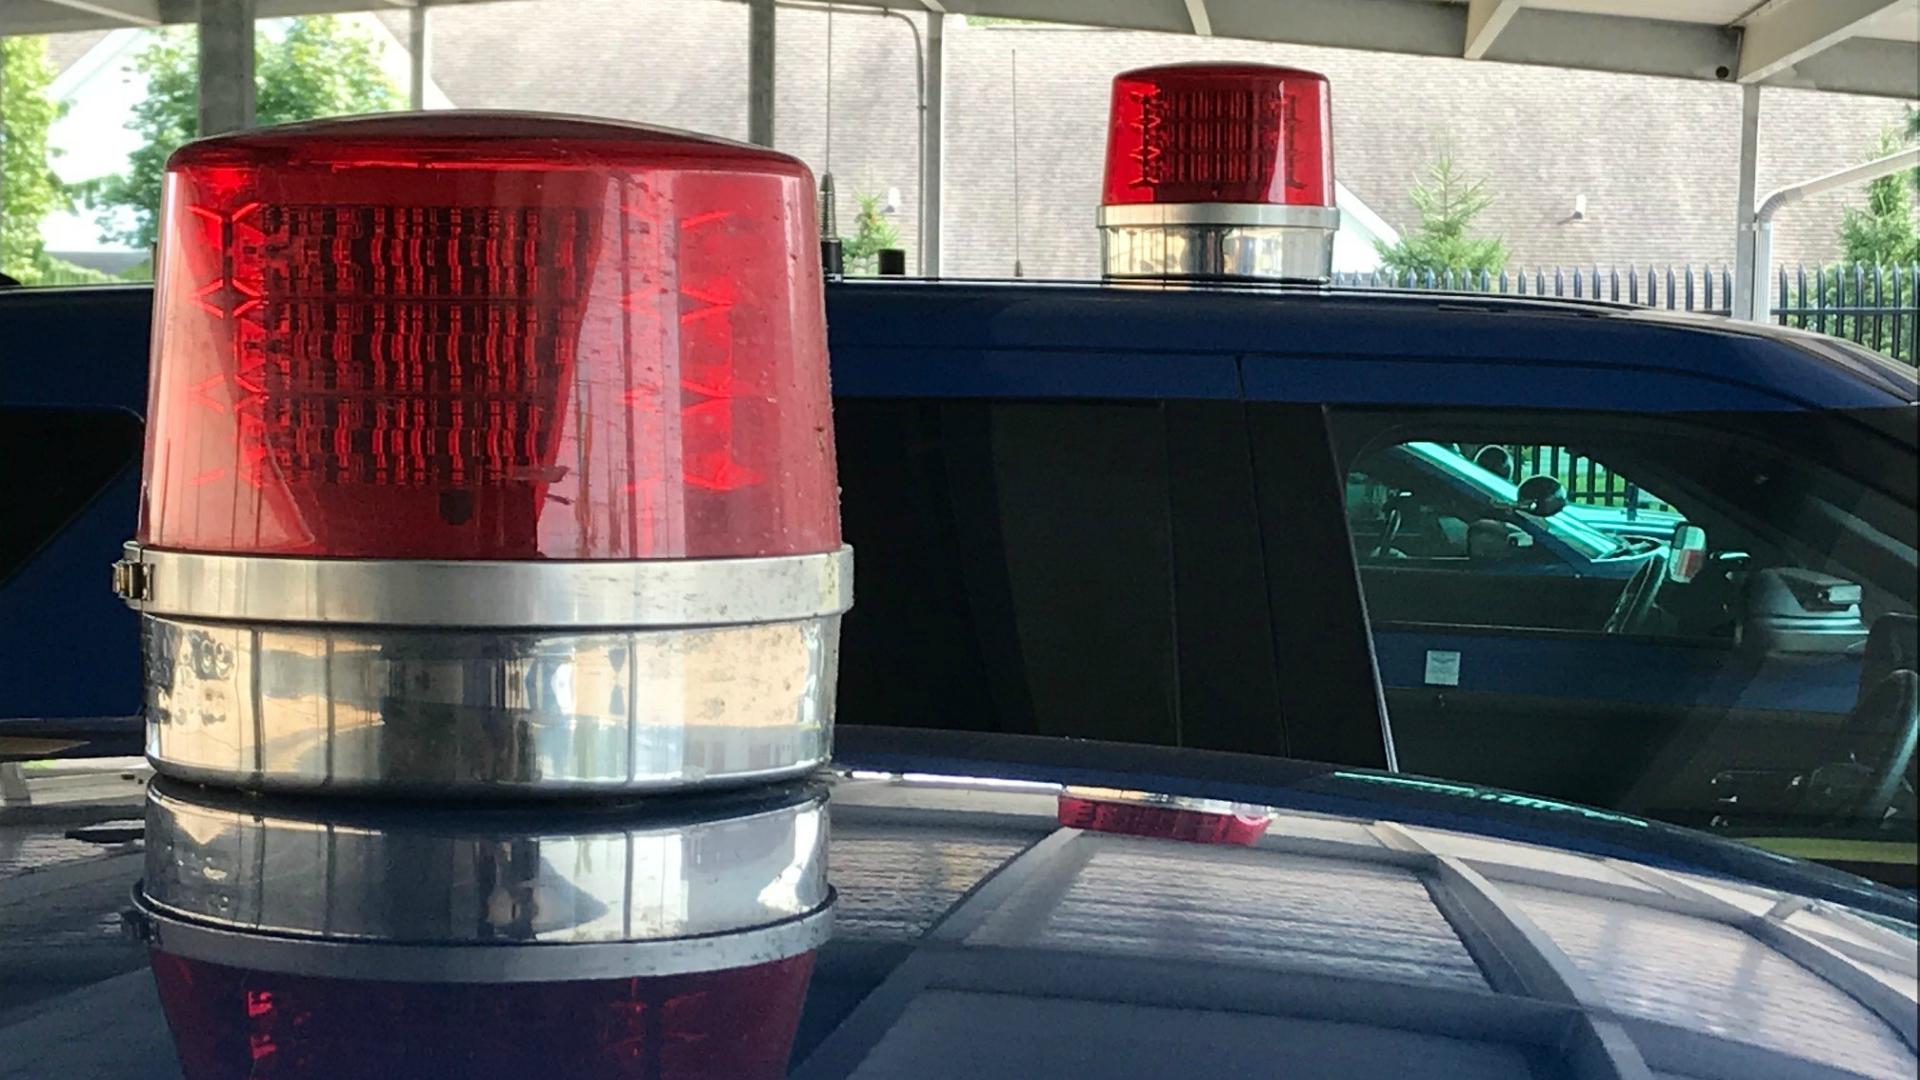 generic Michigan State Police